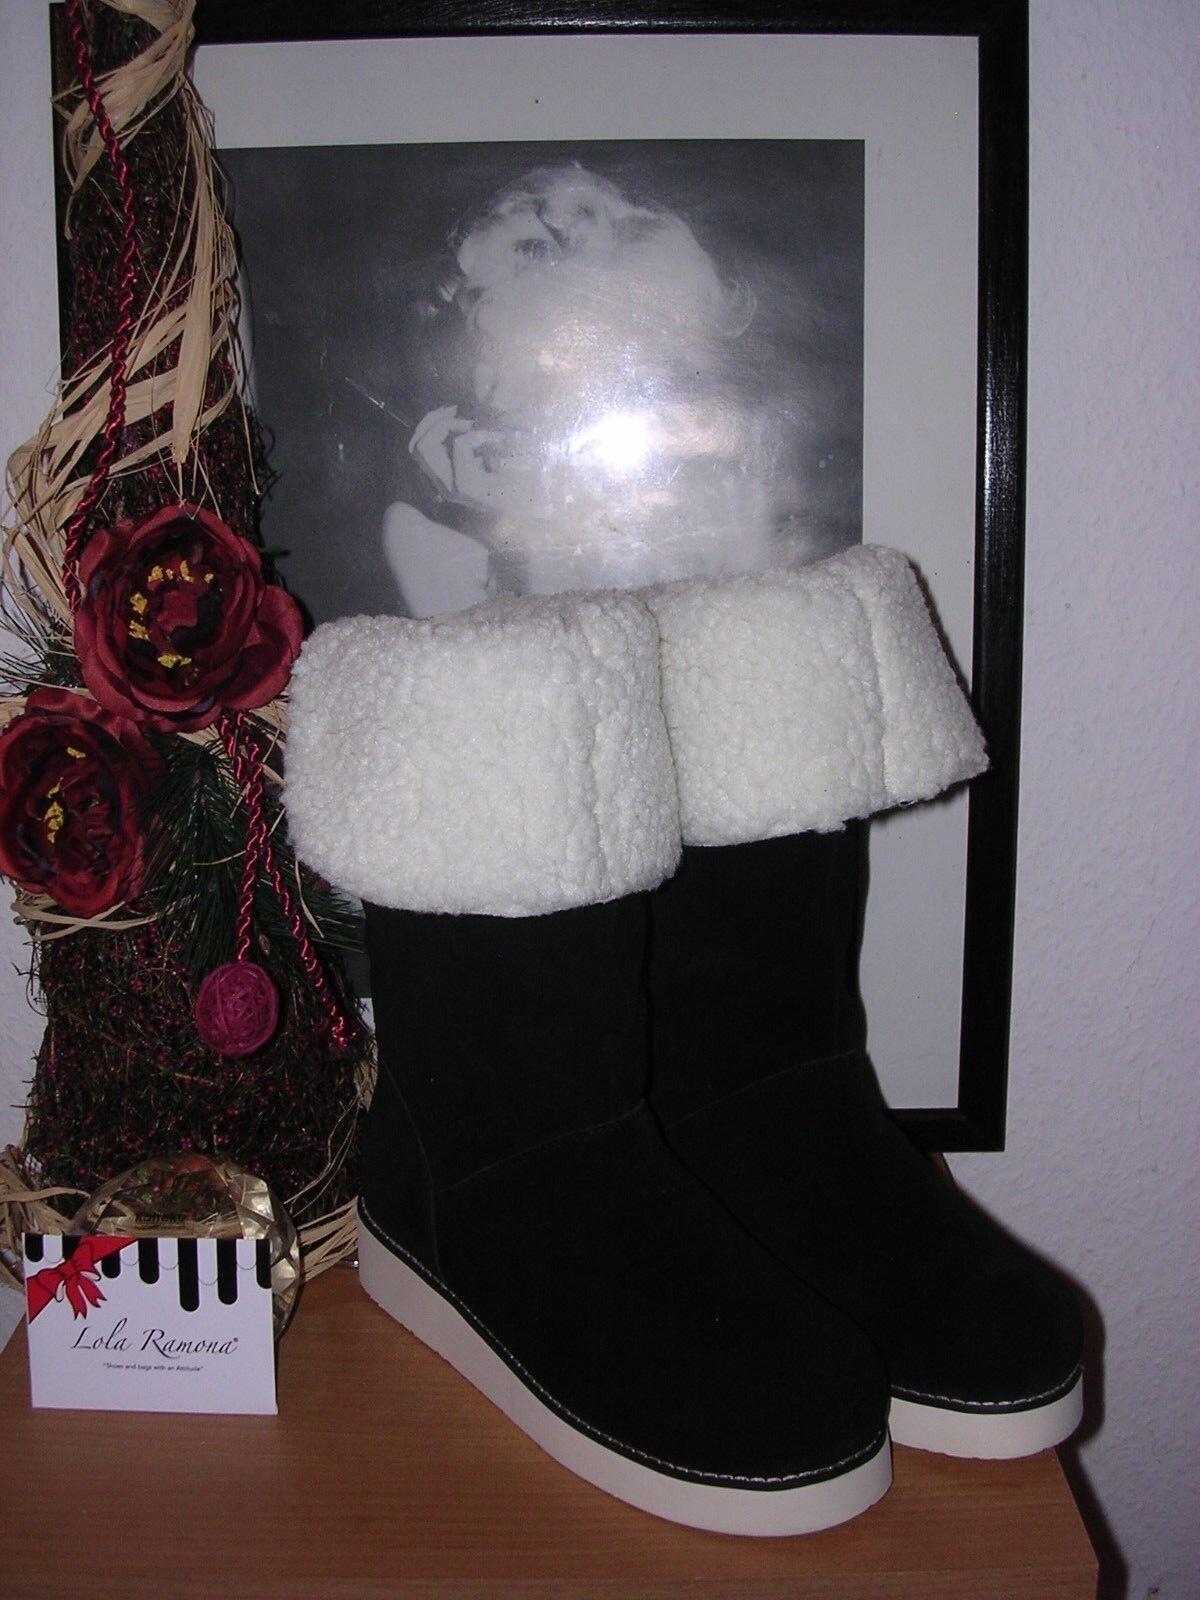 LOLA RAMONA STIEFEL ECHTES LAMMFELL SAMTLEDER 38 NEU ELEGANCE WARM EDEL